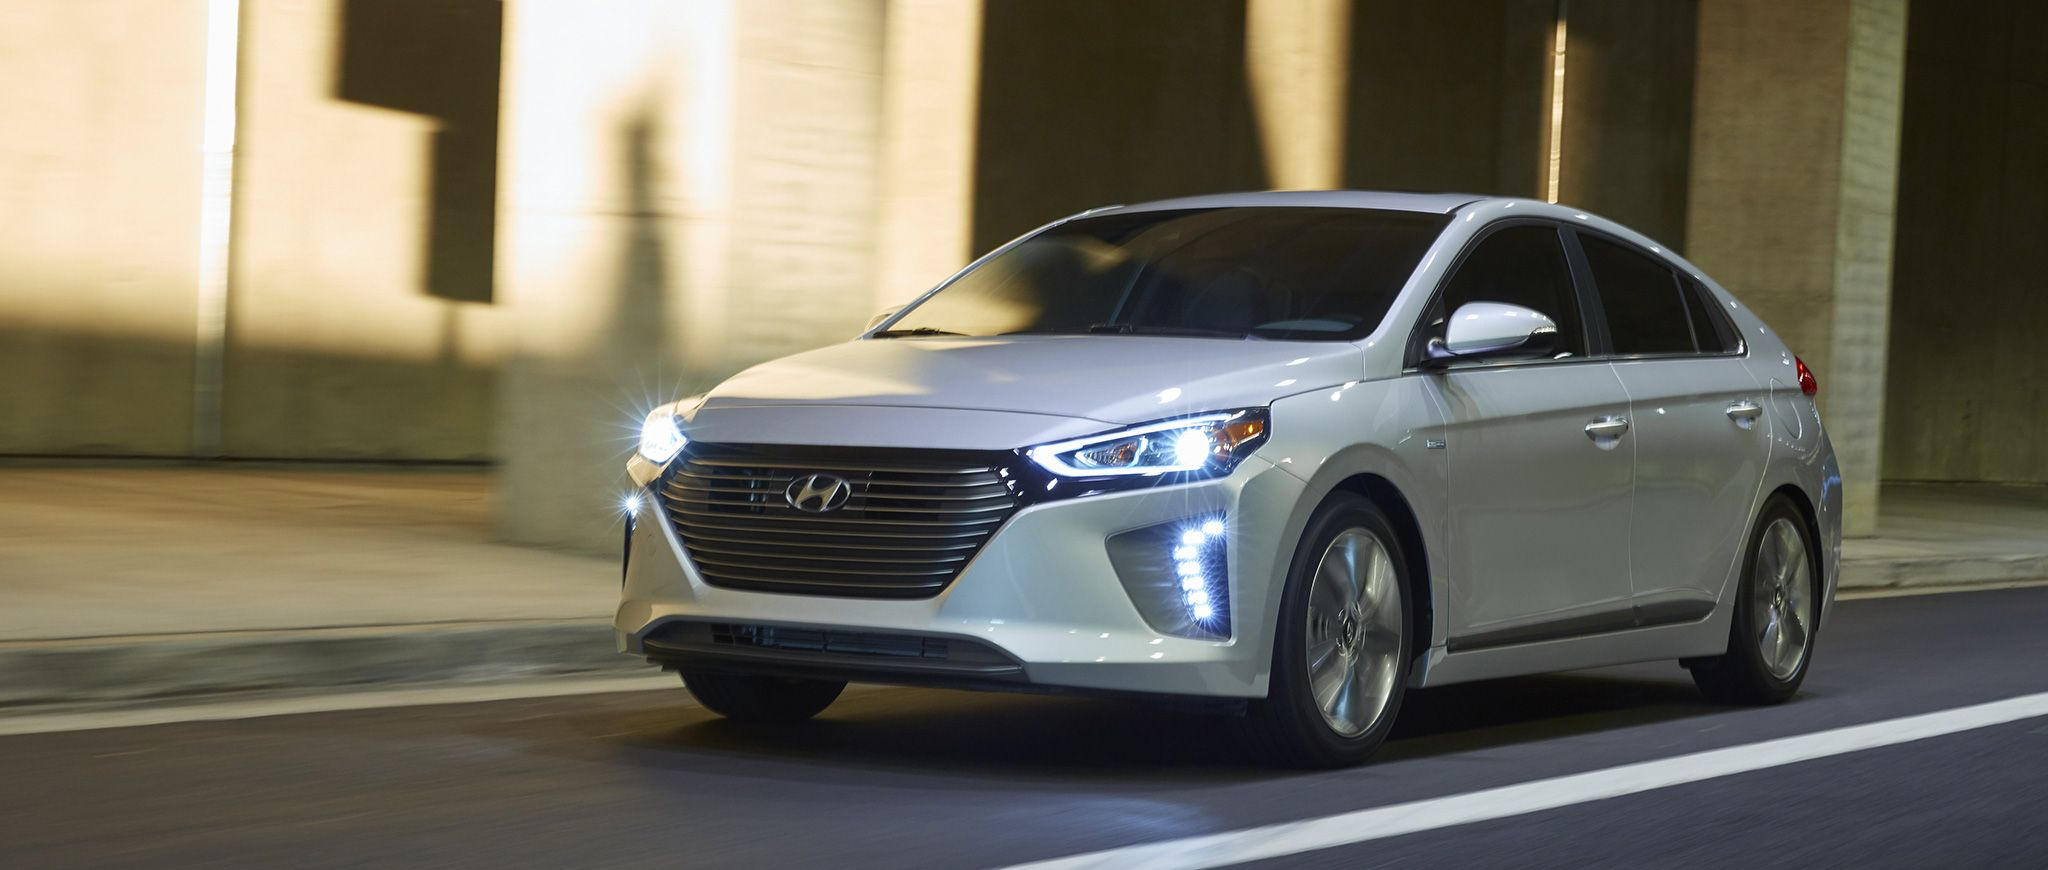 Hyundai Ioniq Hybrid Ev Symphony Air Silver Driver Side Fuel Efficient Cars Hyundai Most Fuel Efficient Cars